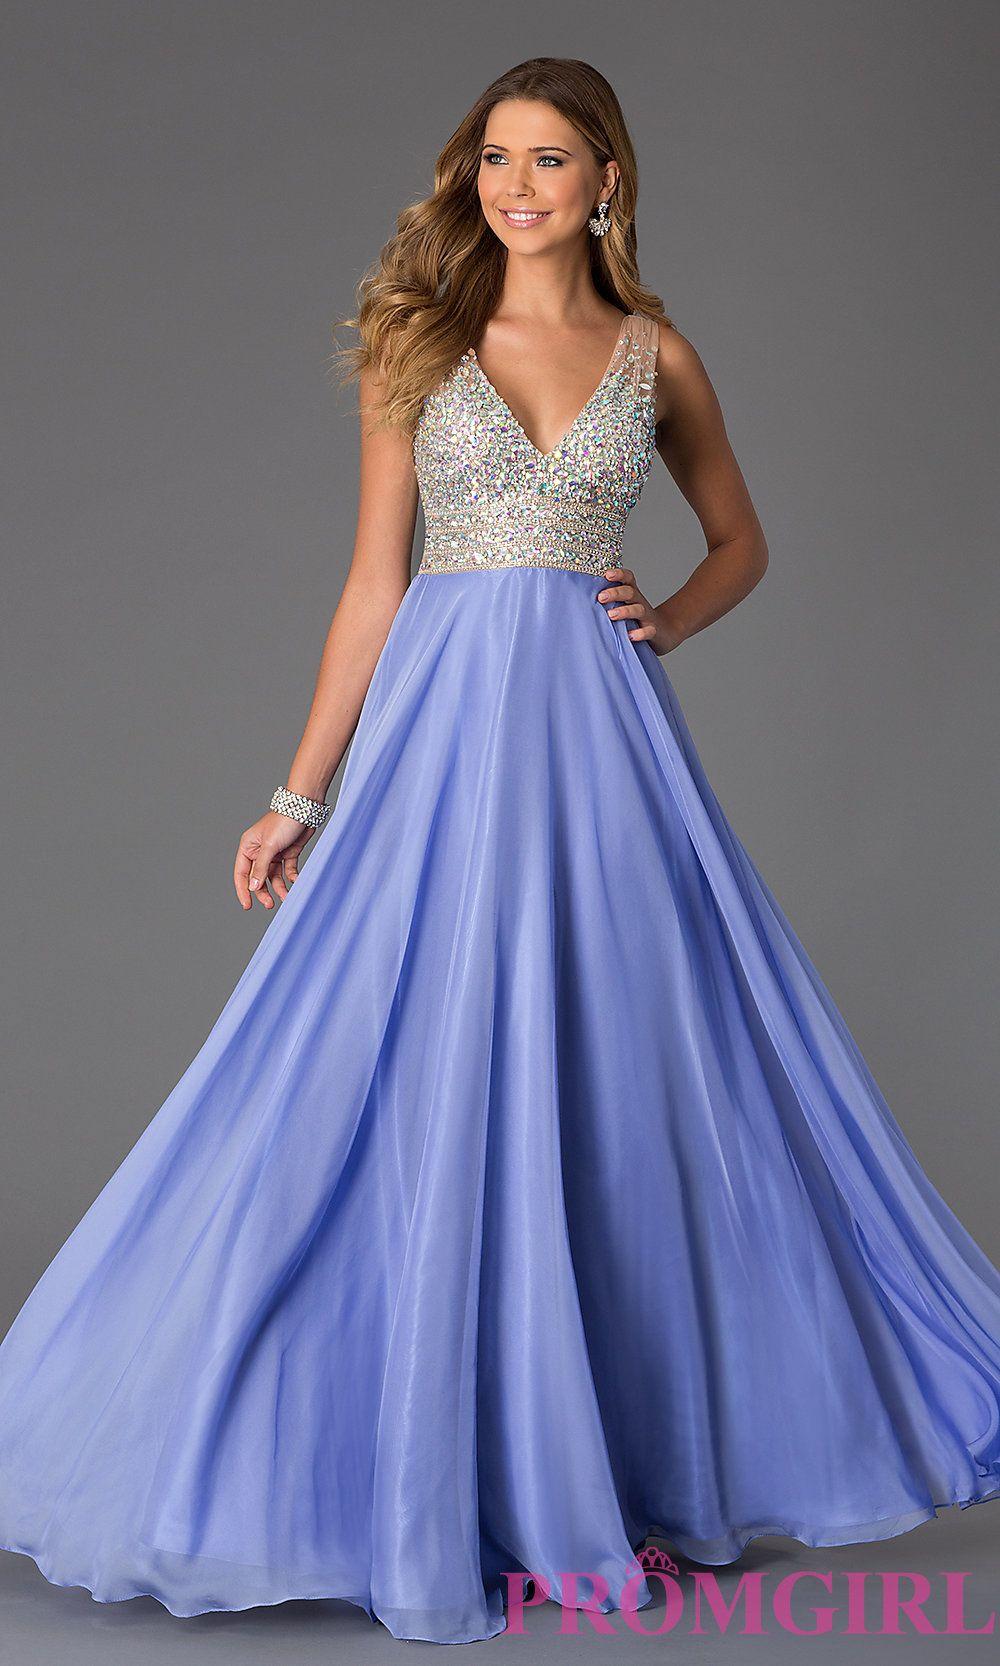 Sleeveless Floor Length V-Neck Dress by JVN by Jovani | Formal ...